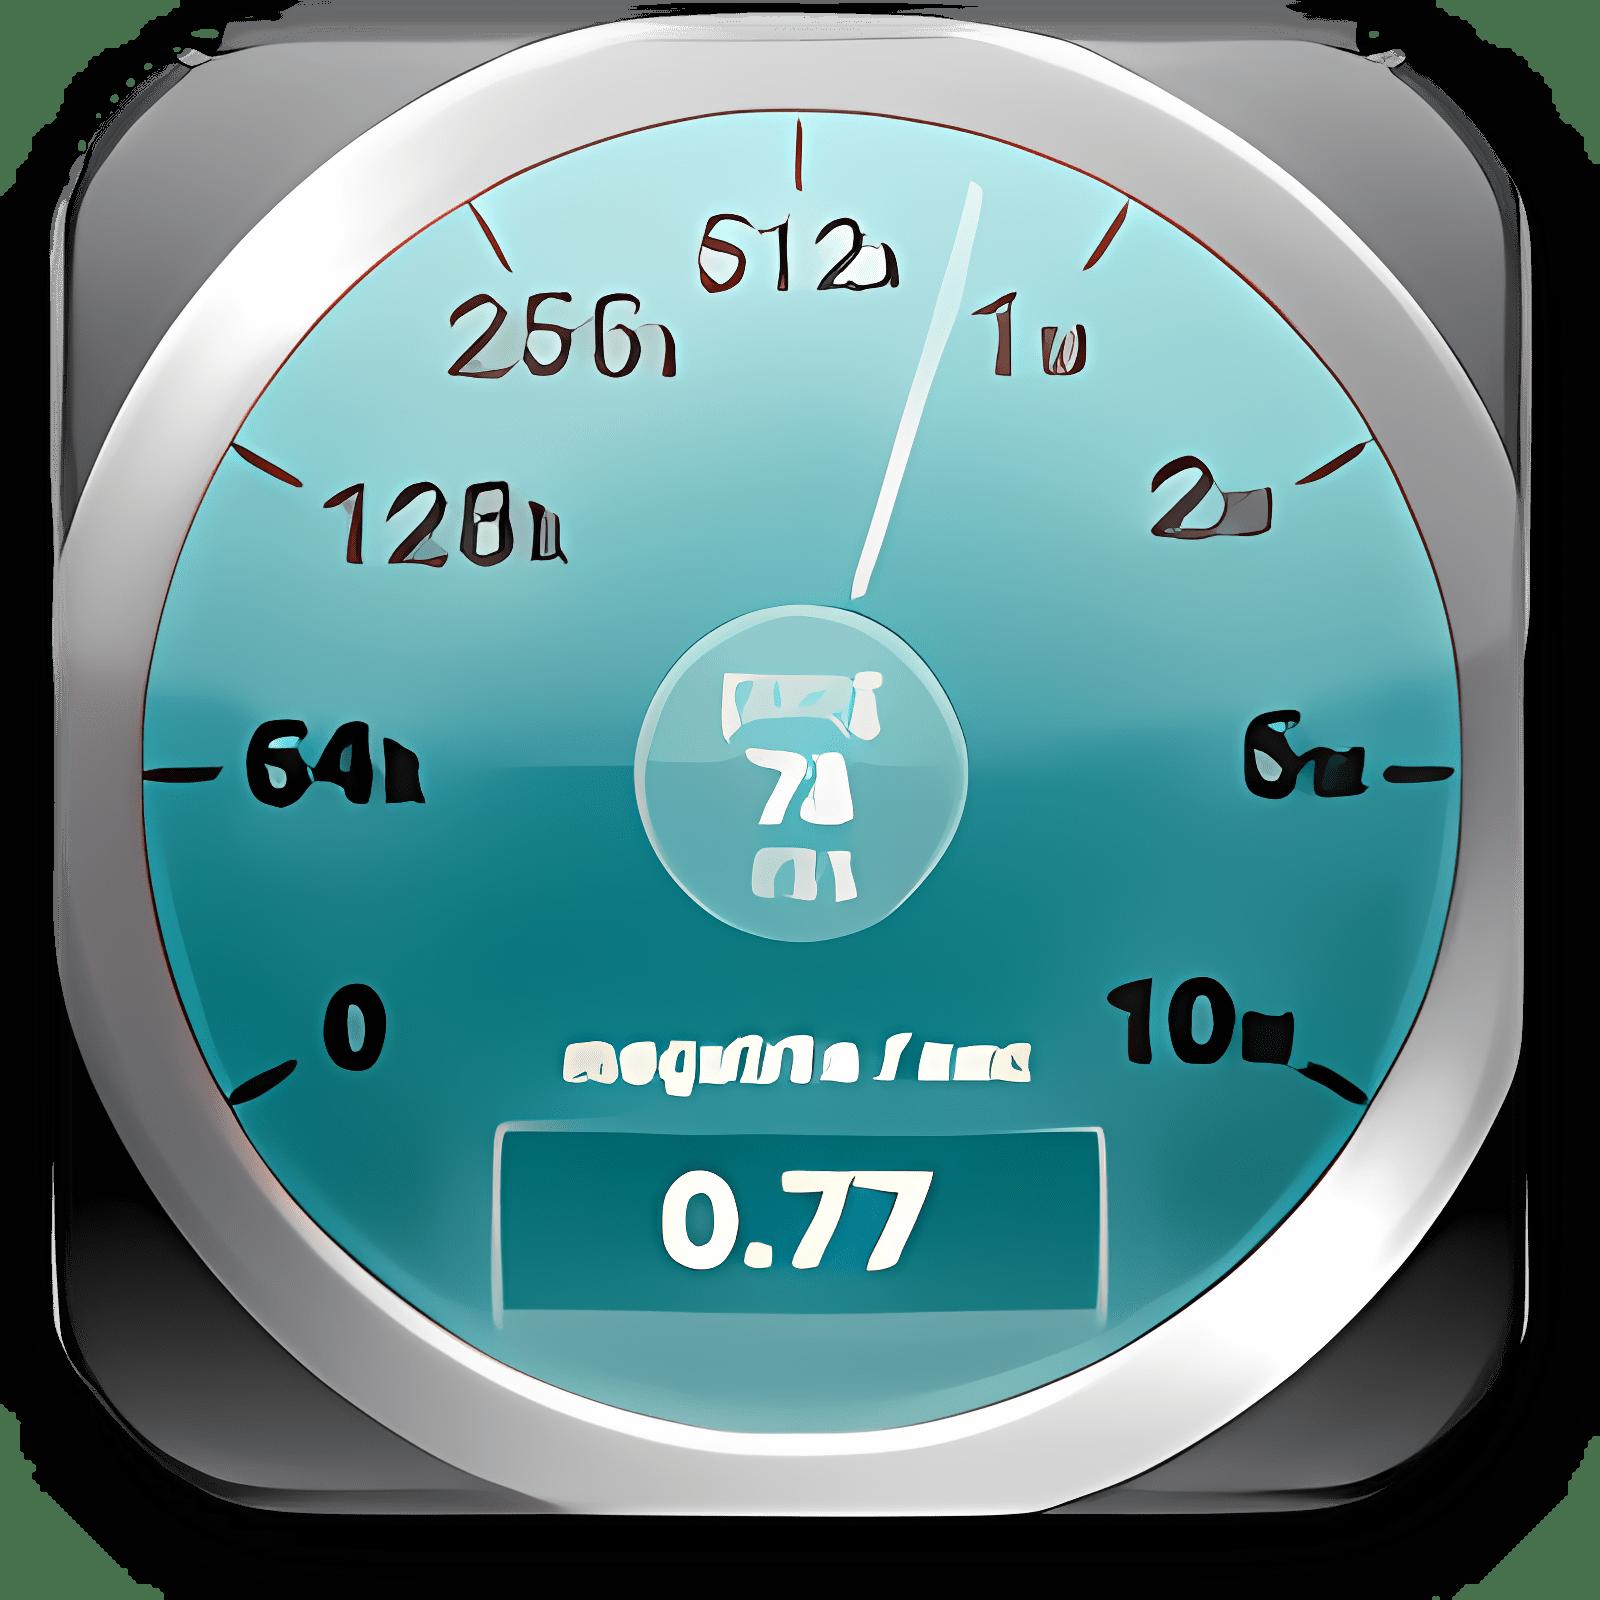 Speedtest.net